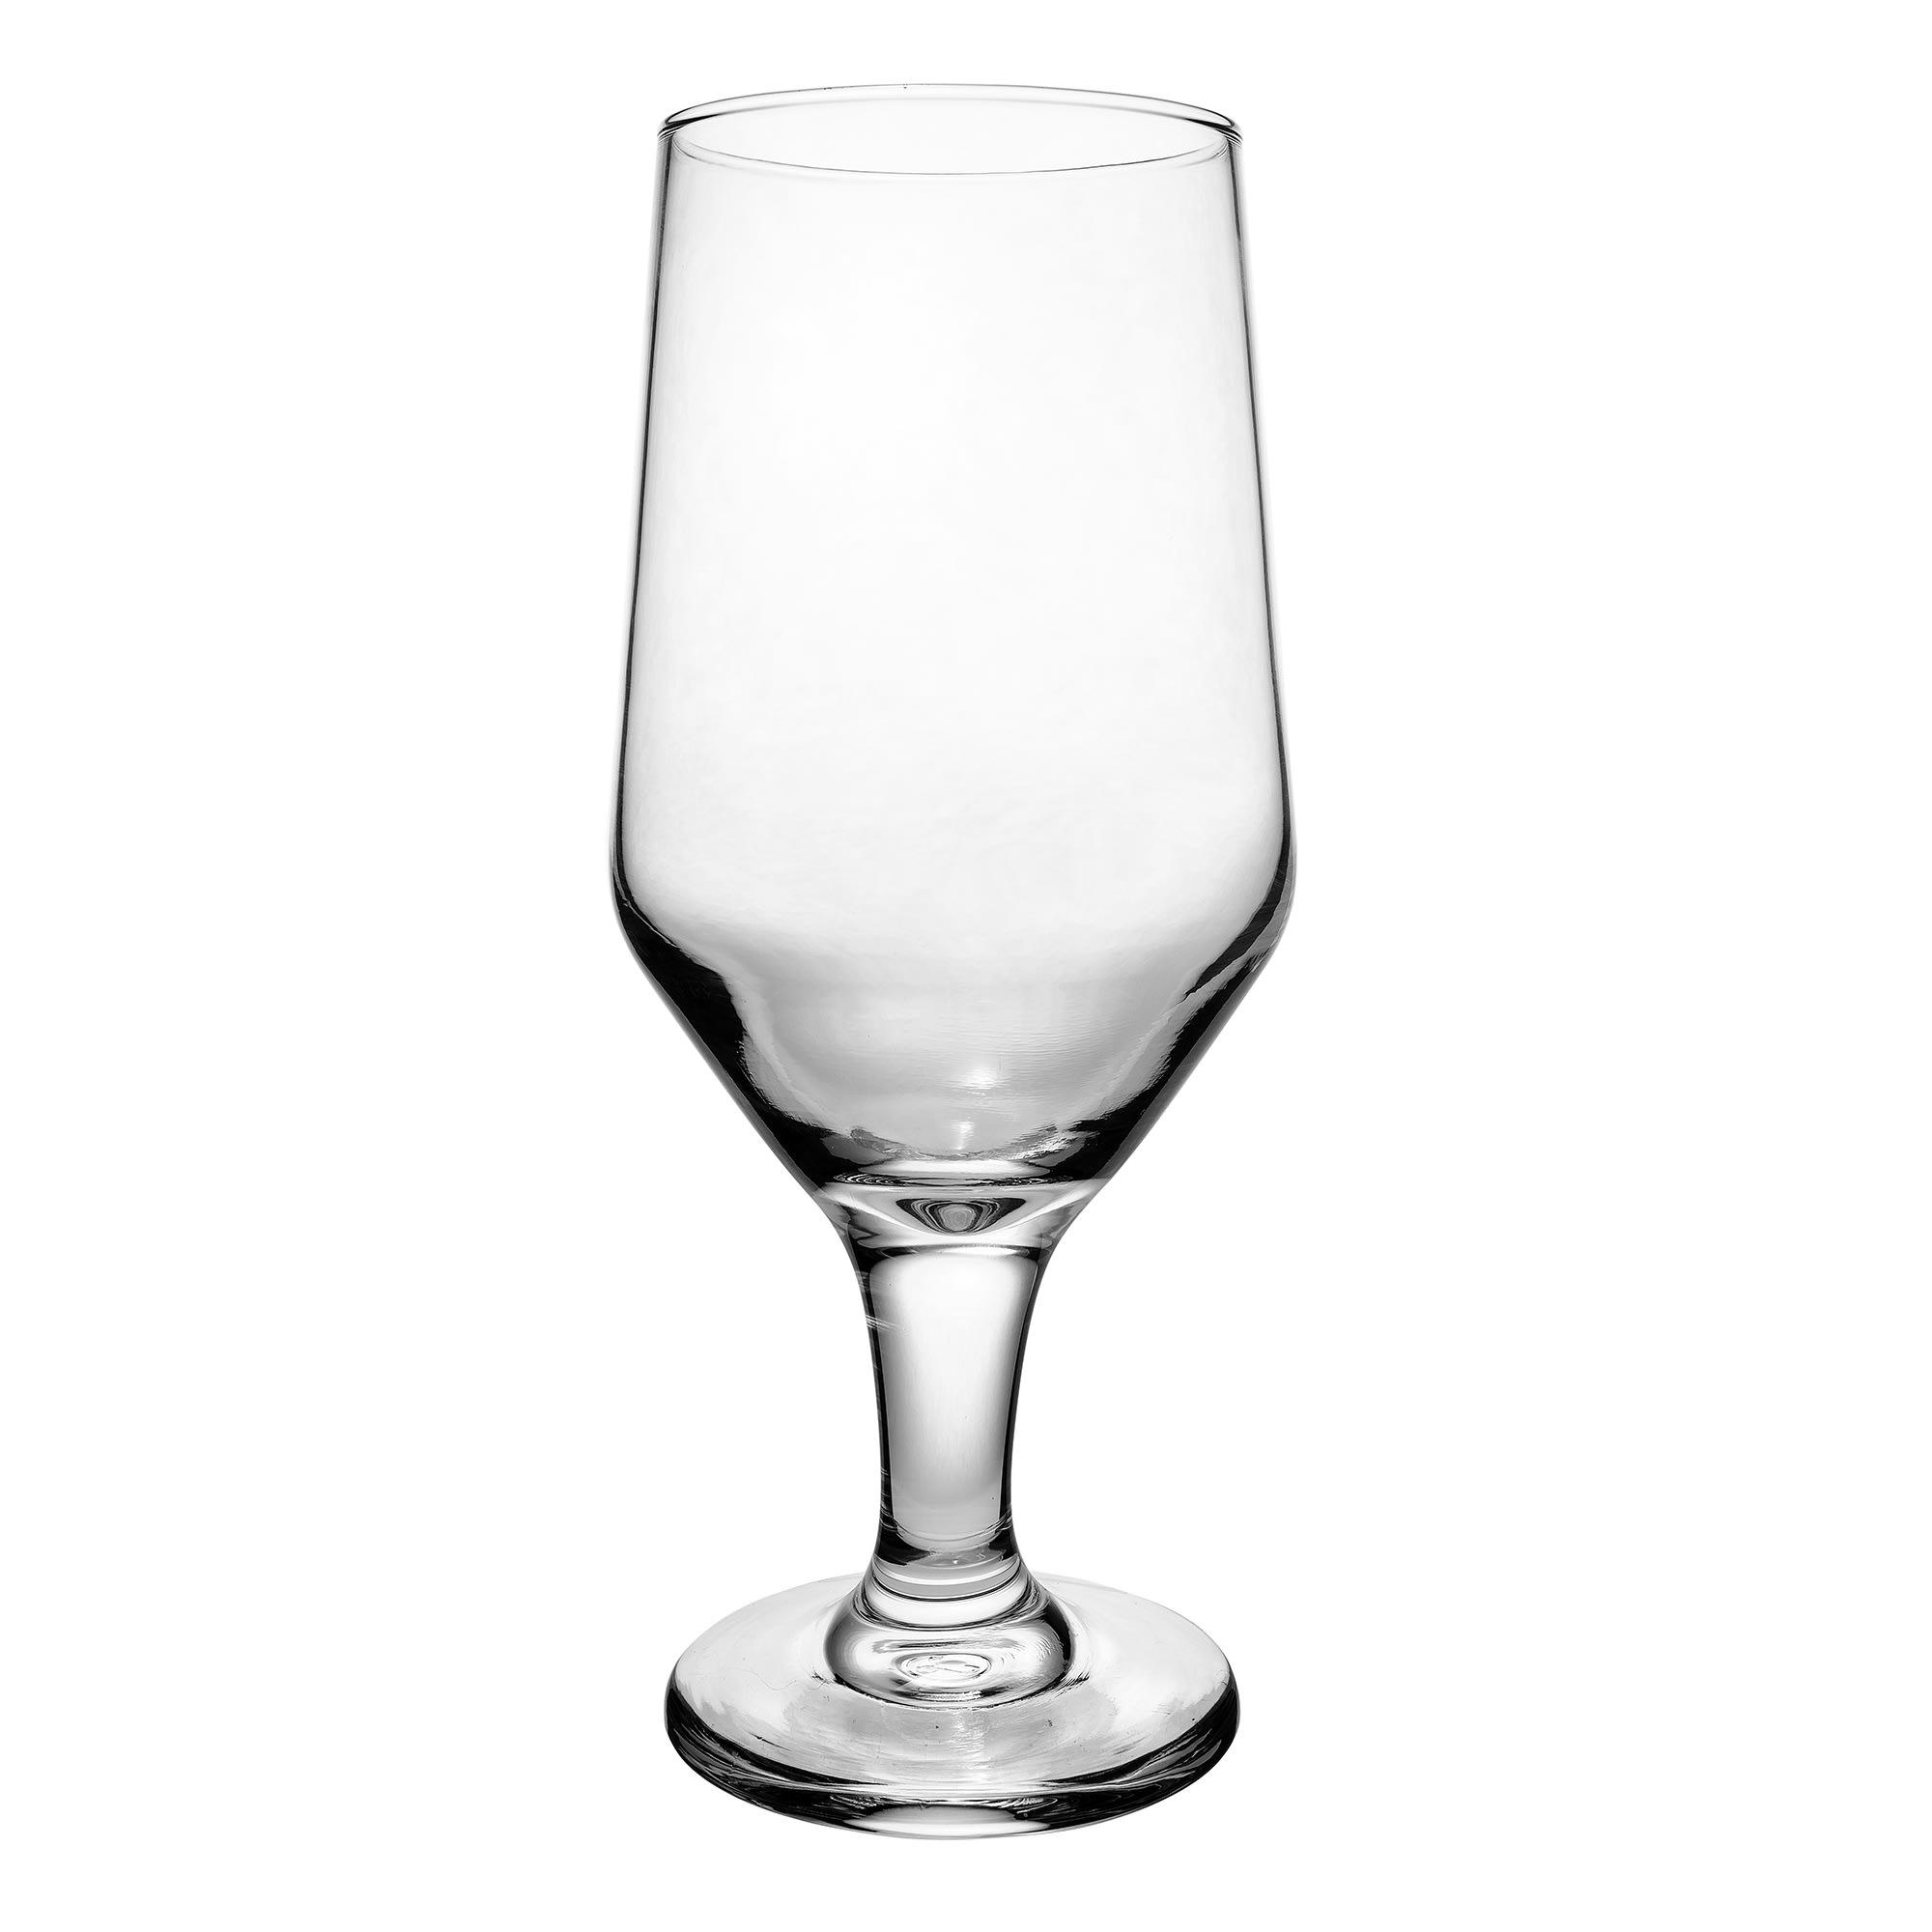 Libbey 3328 12 oz Estate Beer Glass - Safedge Rim & Foot Guarantee